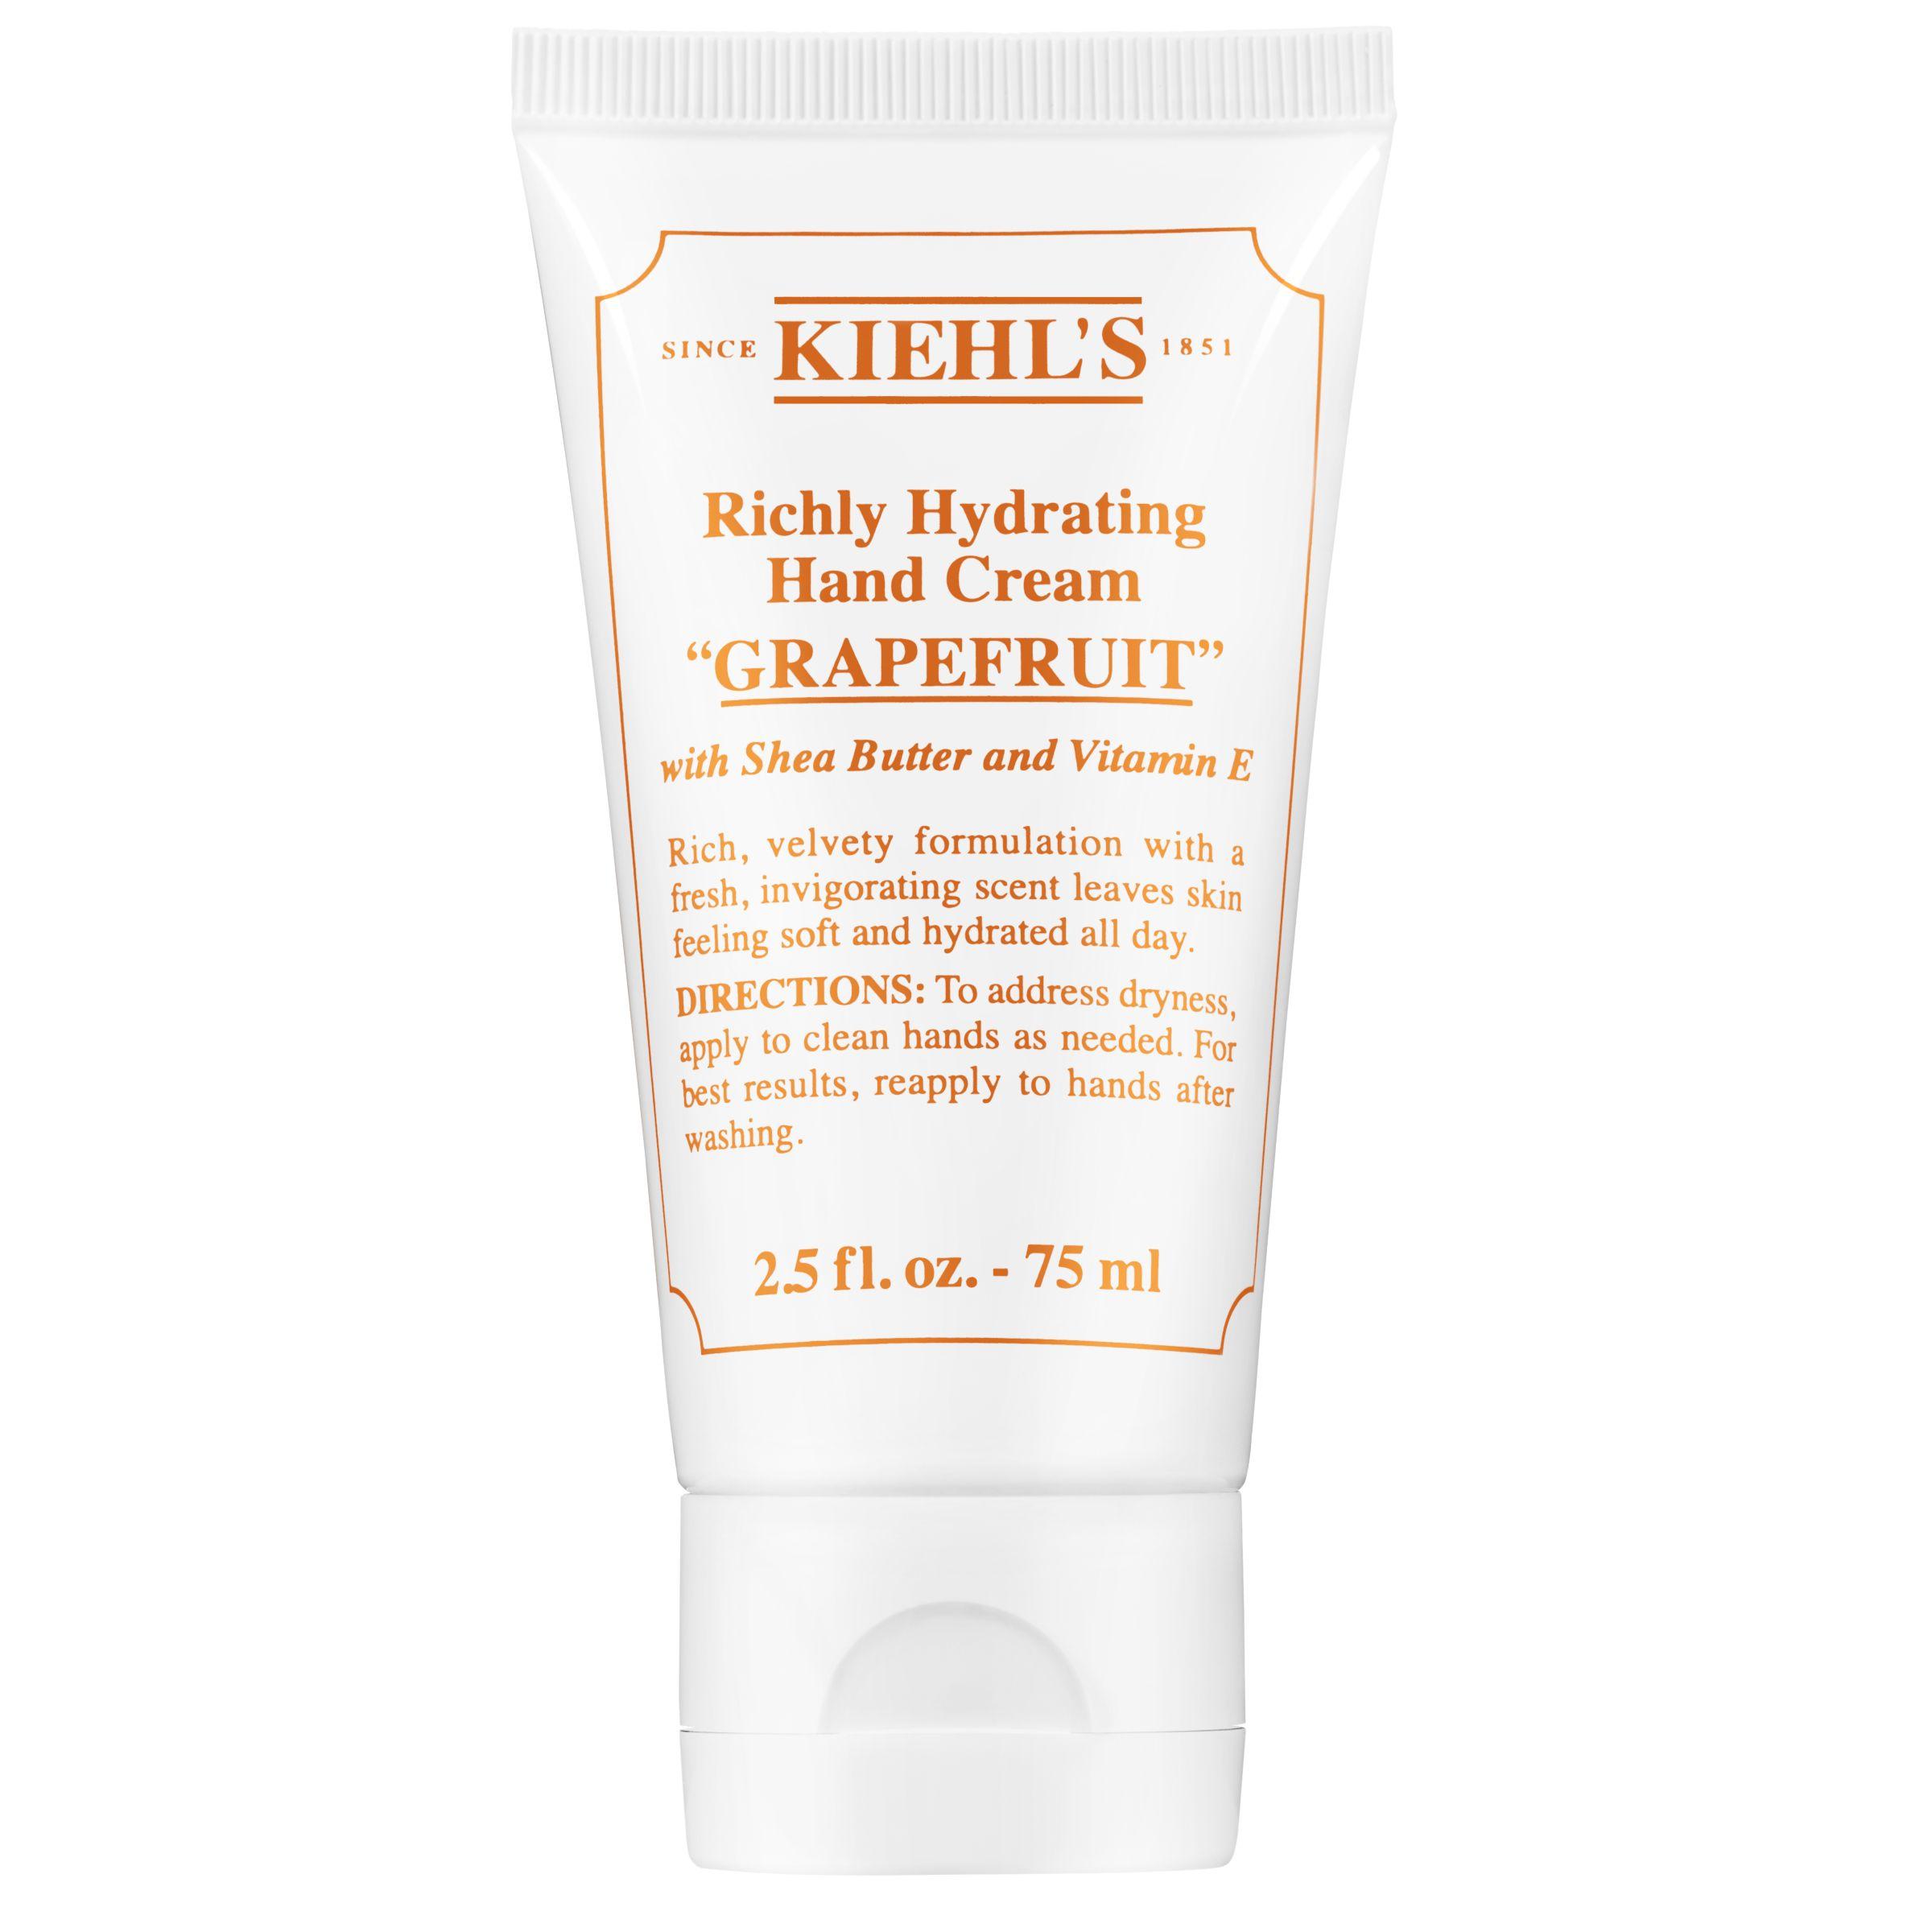 Kiehls Kiehl's Richly Hydrating Hand Cream, Grapefruit , 75ml